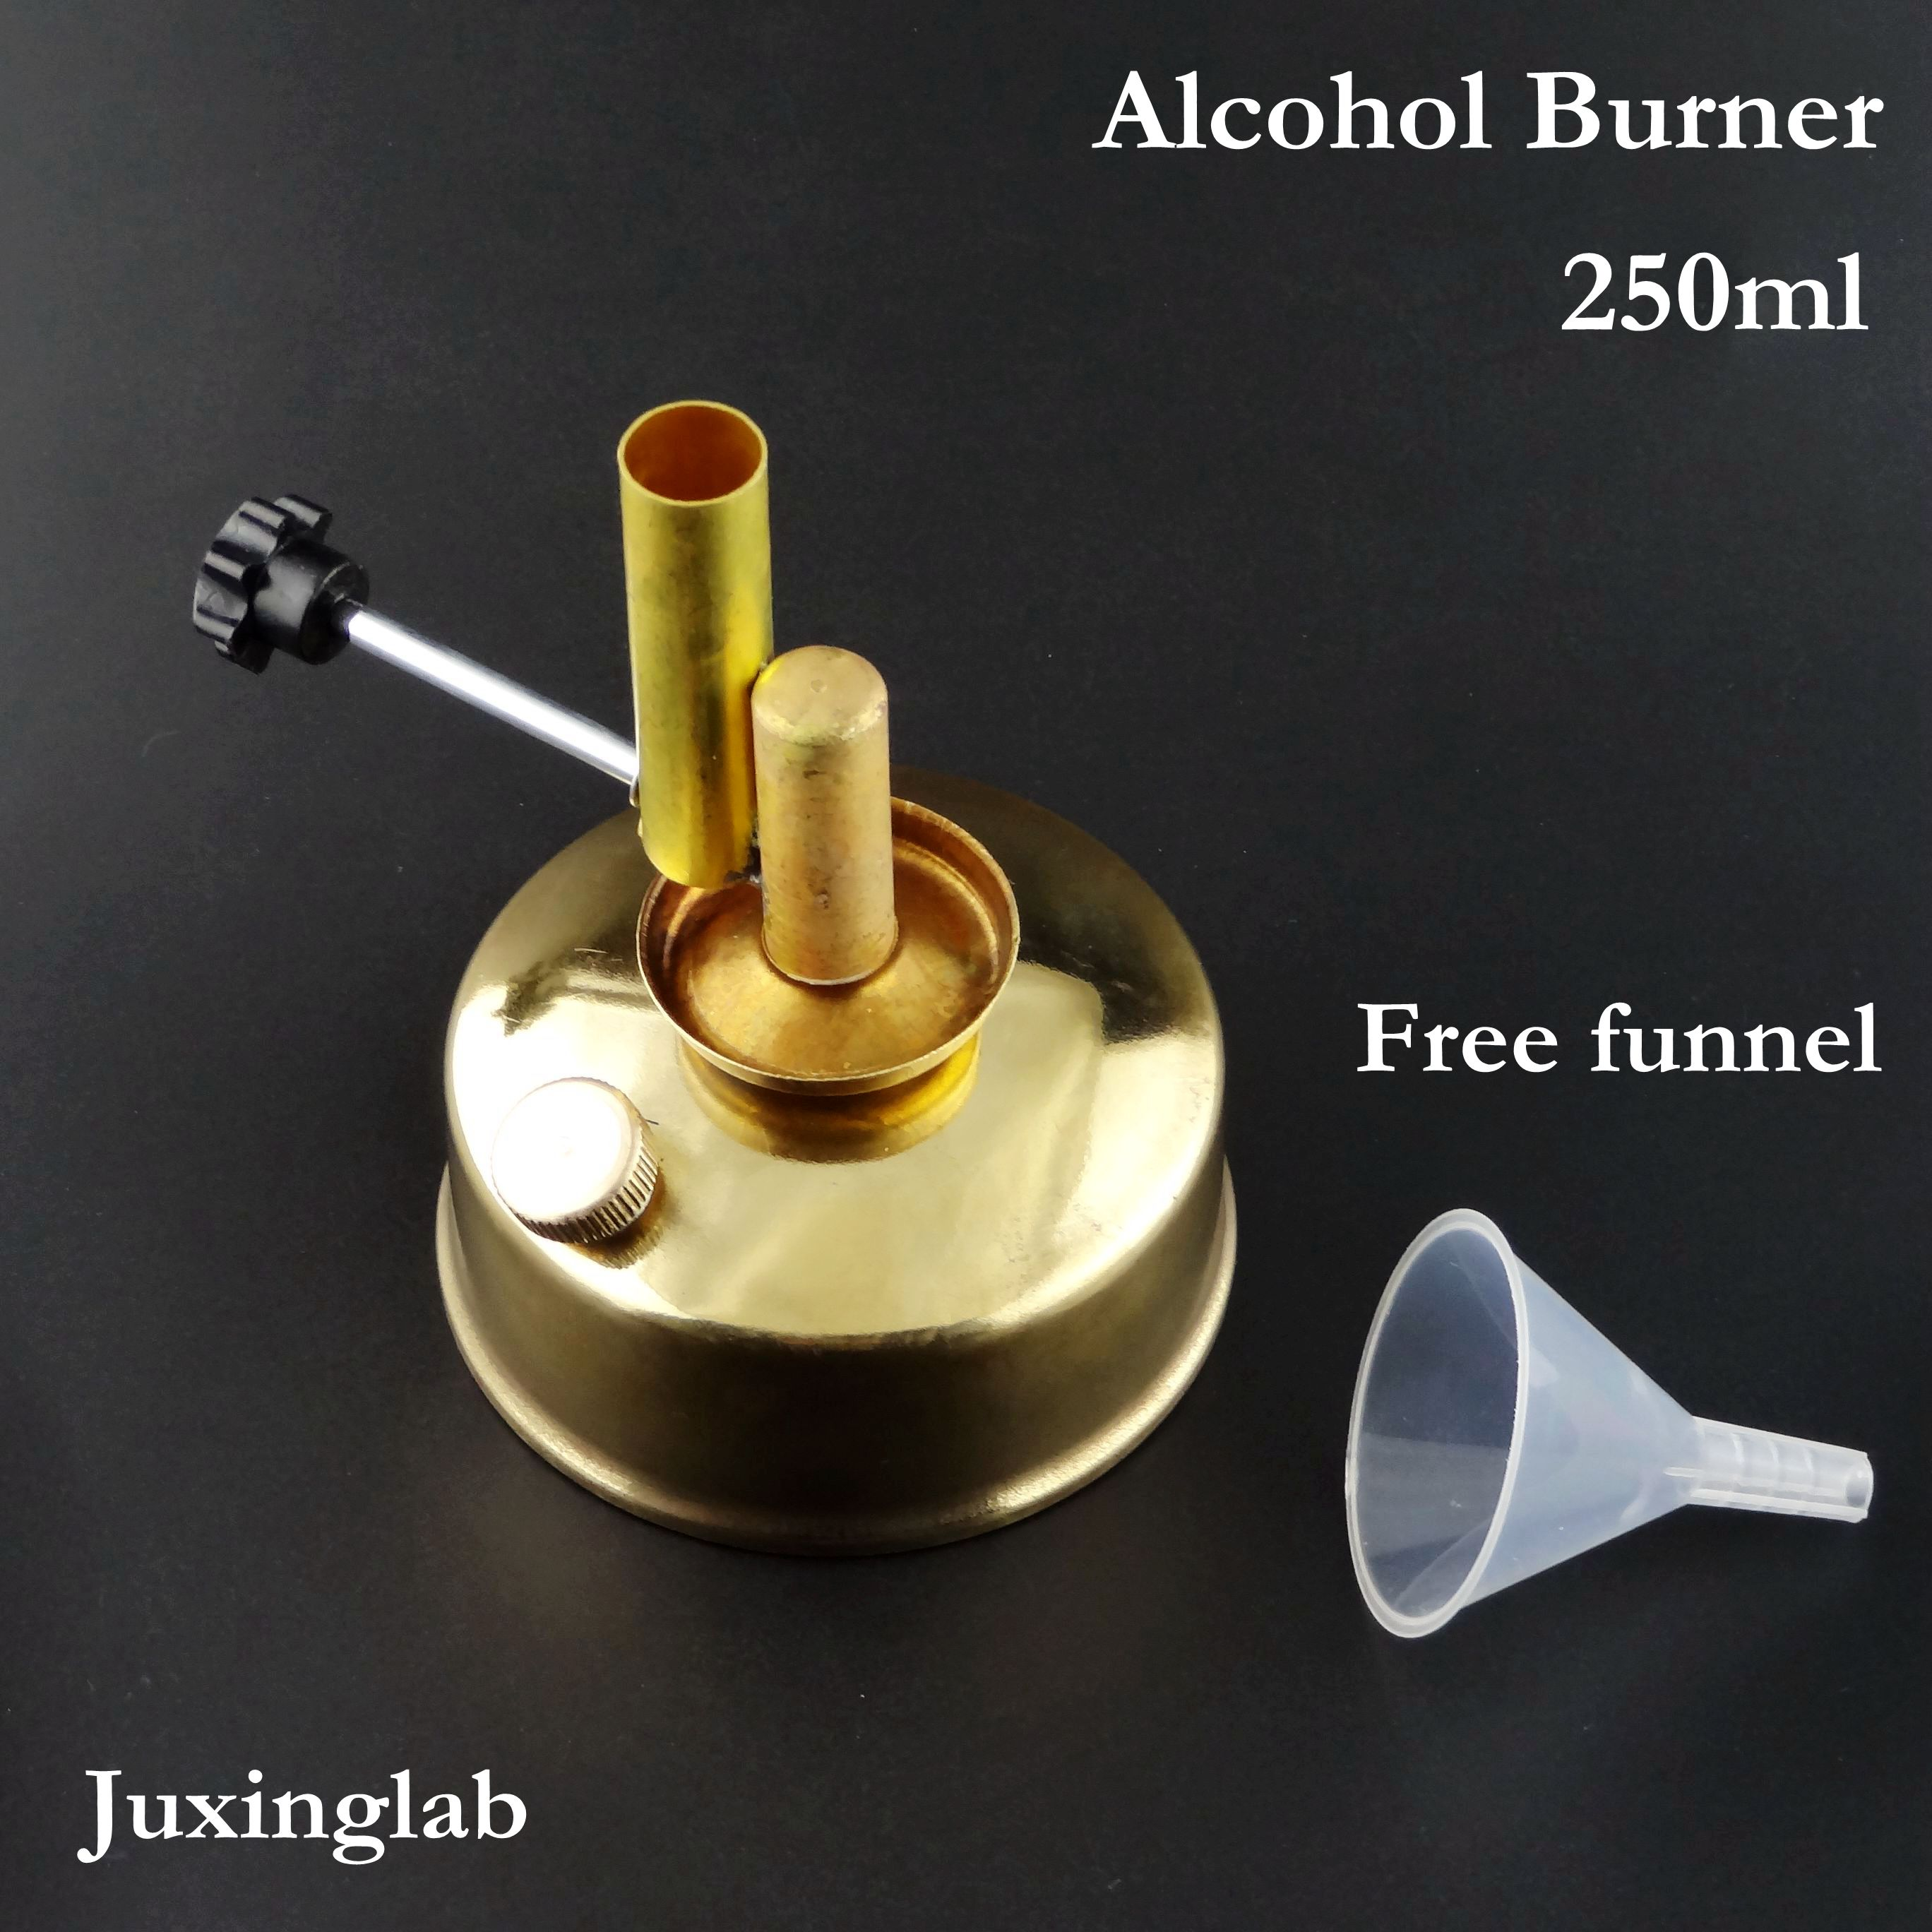 Alcohol Lamp Burner 250ml Made Of Brass ,copper Tirrill Burner Meker Burner Micro Brass Burner 250ml